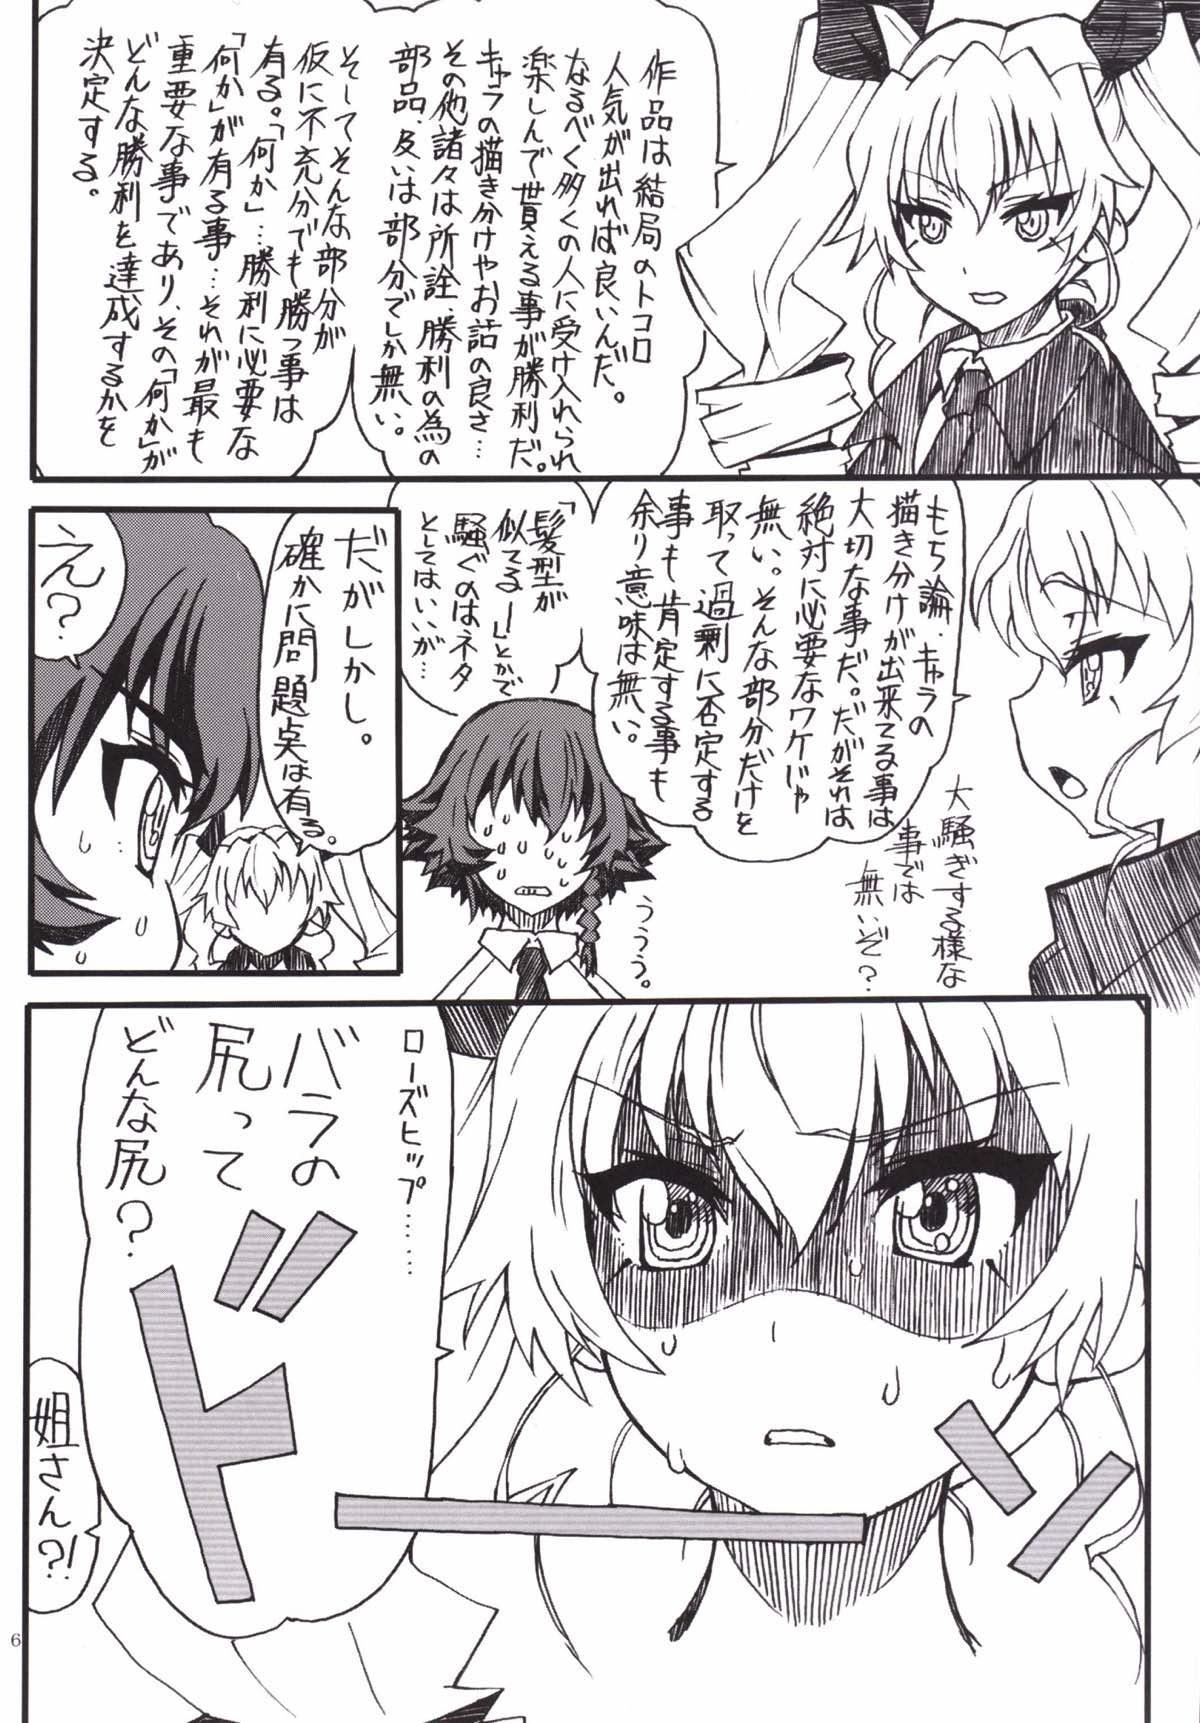 The Chiyomi 4